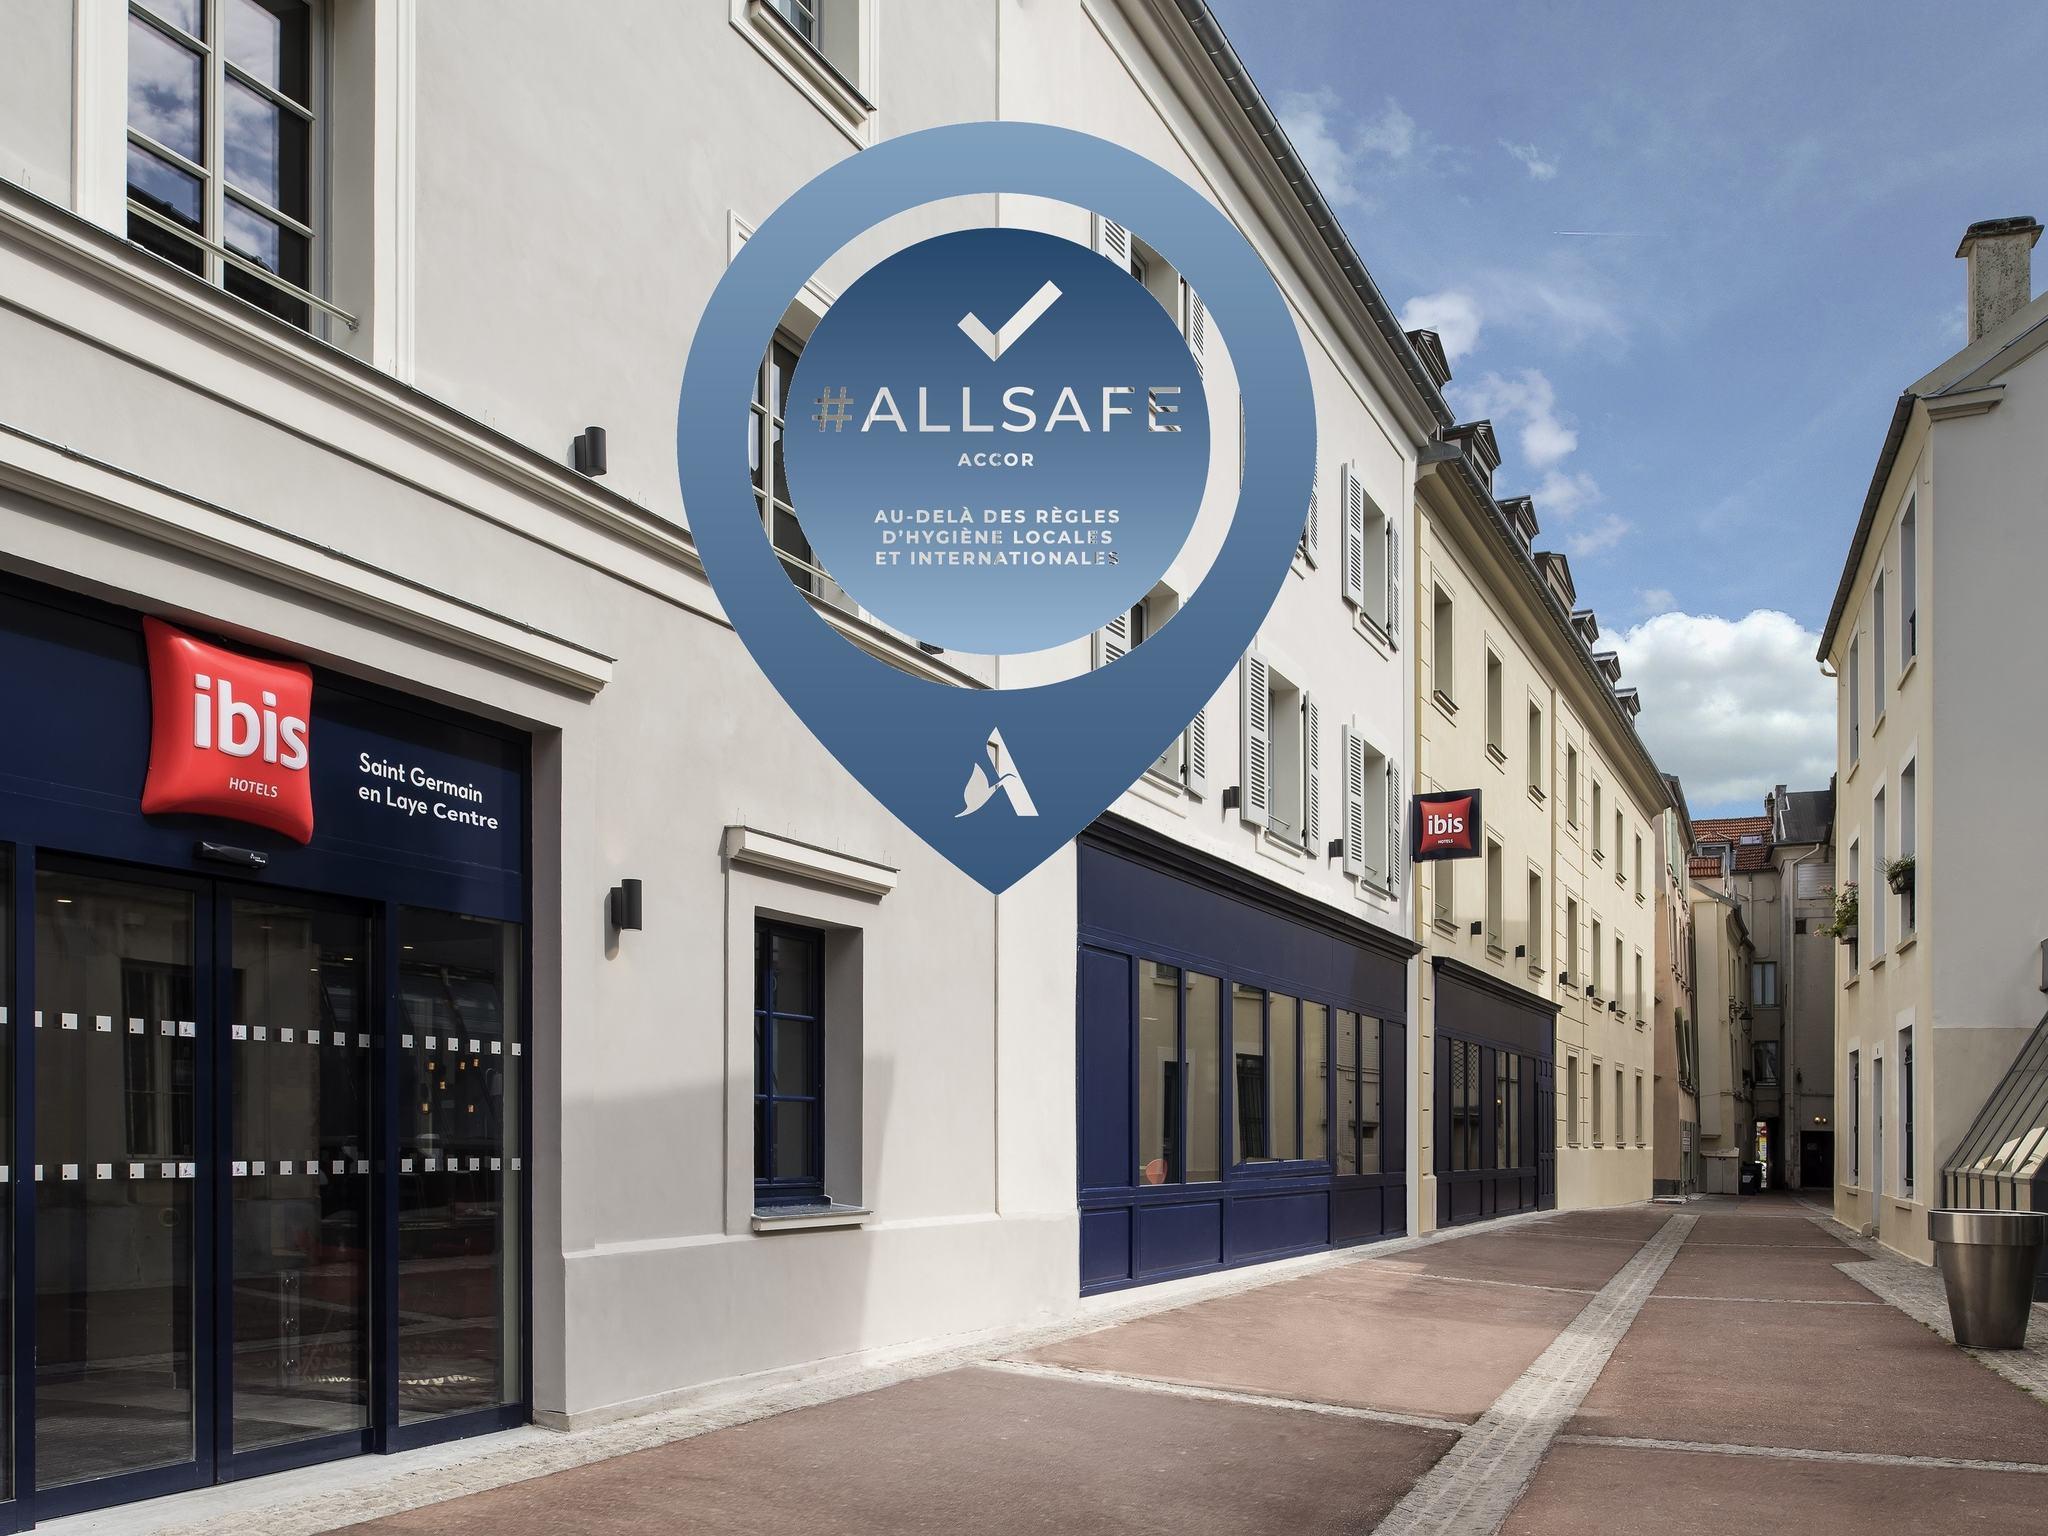 Hotel – ibis Saint-Germain-en-Laye Centre